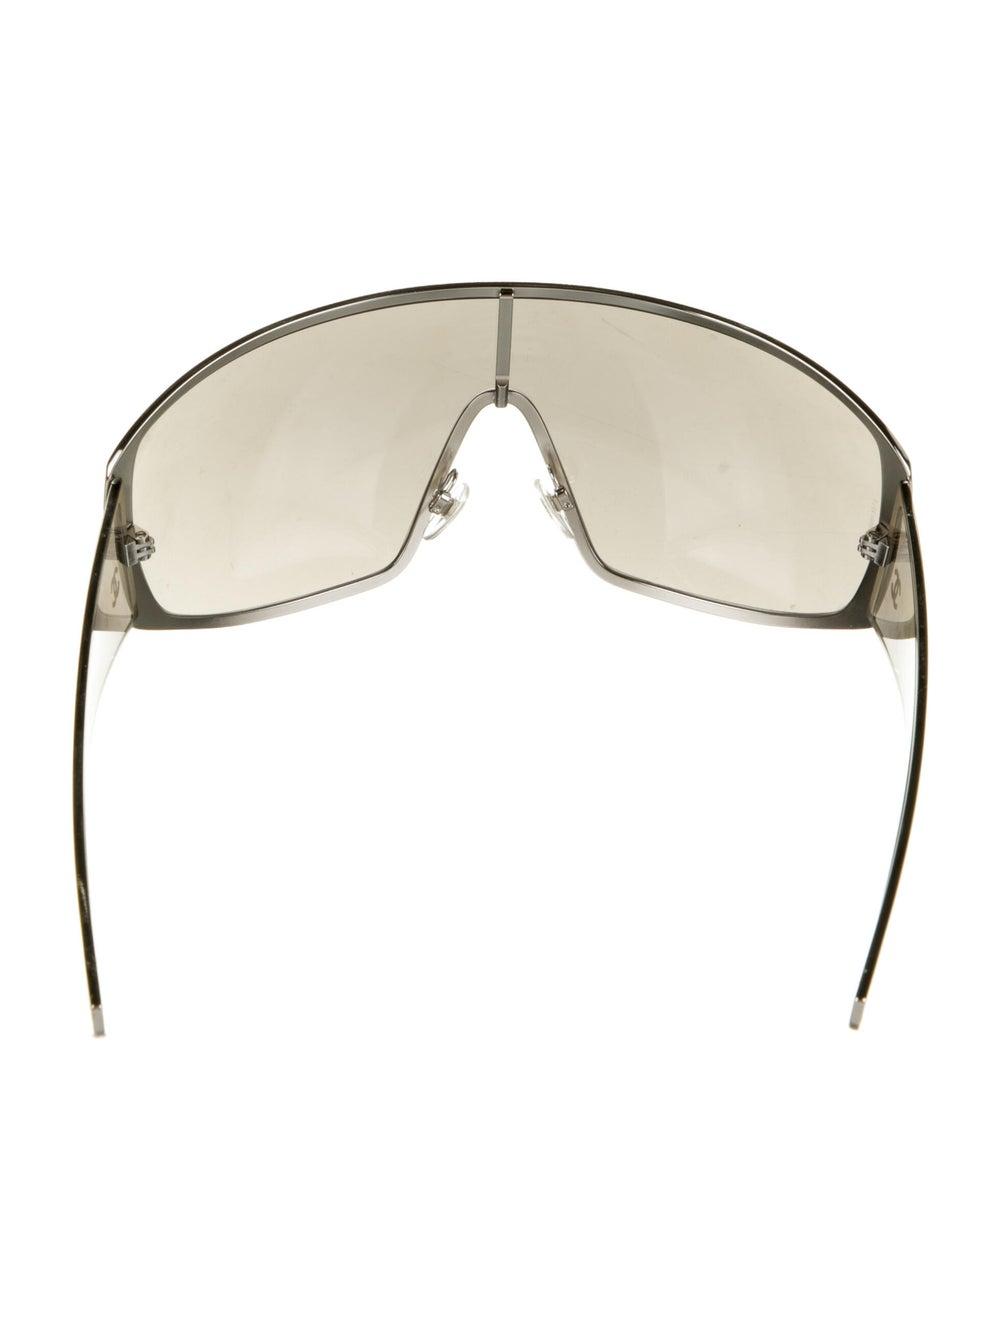 Chanel Runway Shield Sunglasses Silver - image 3